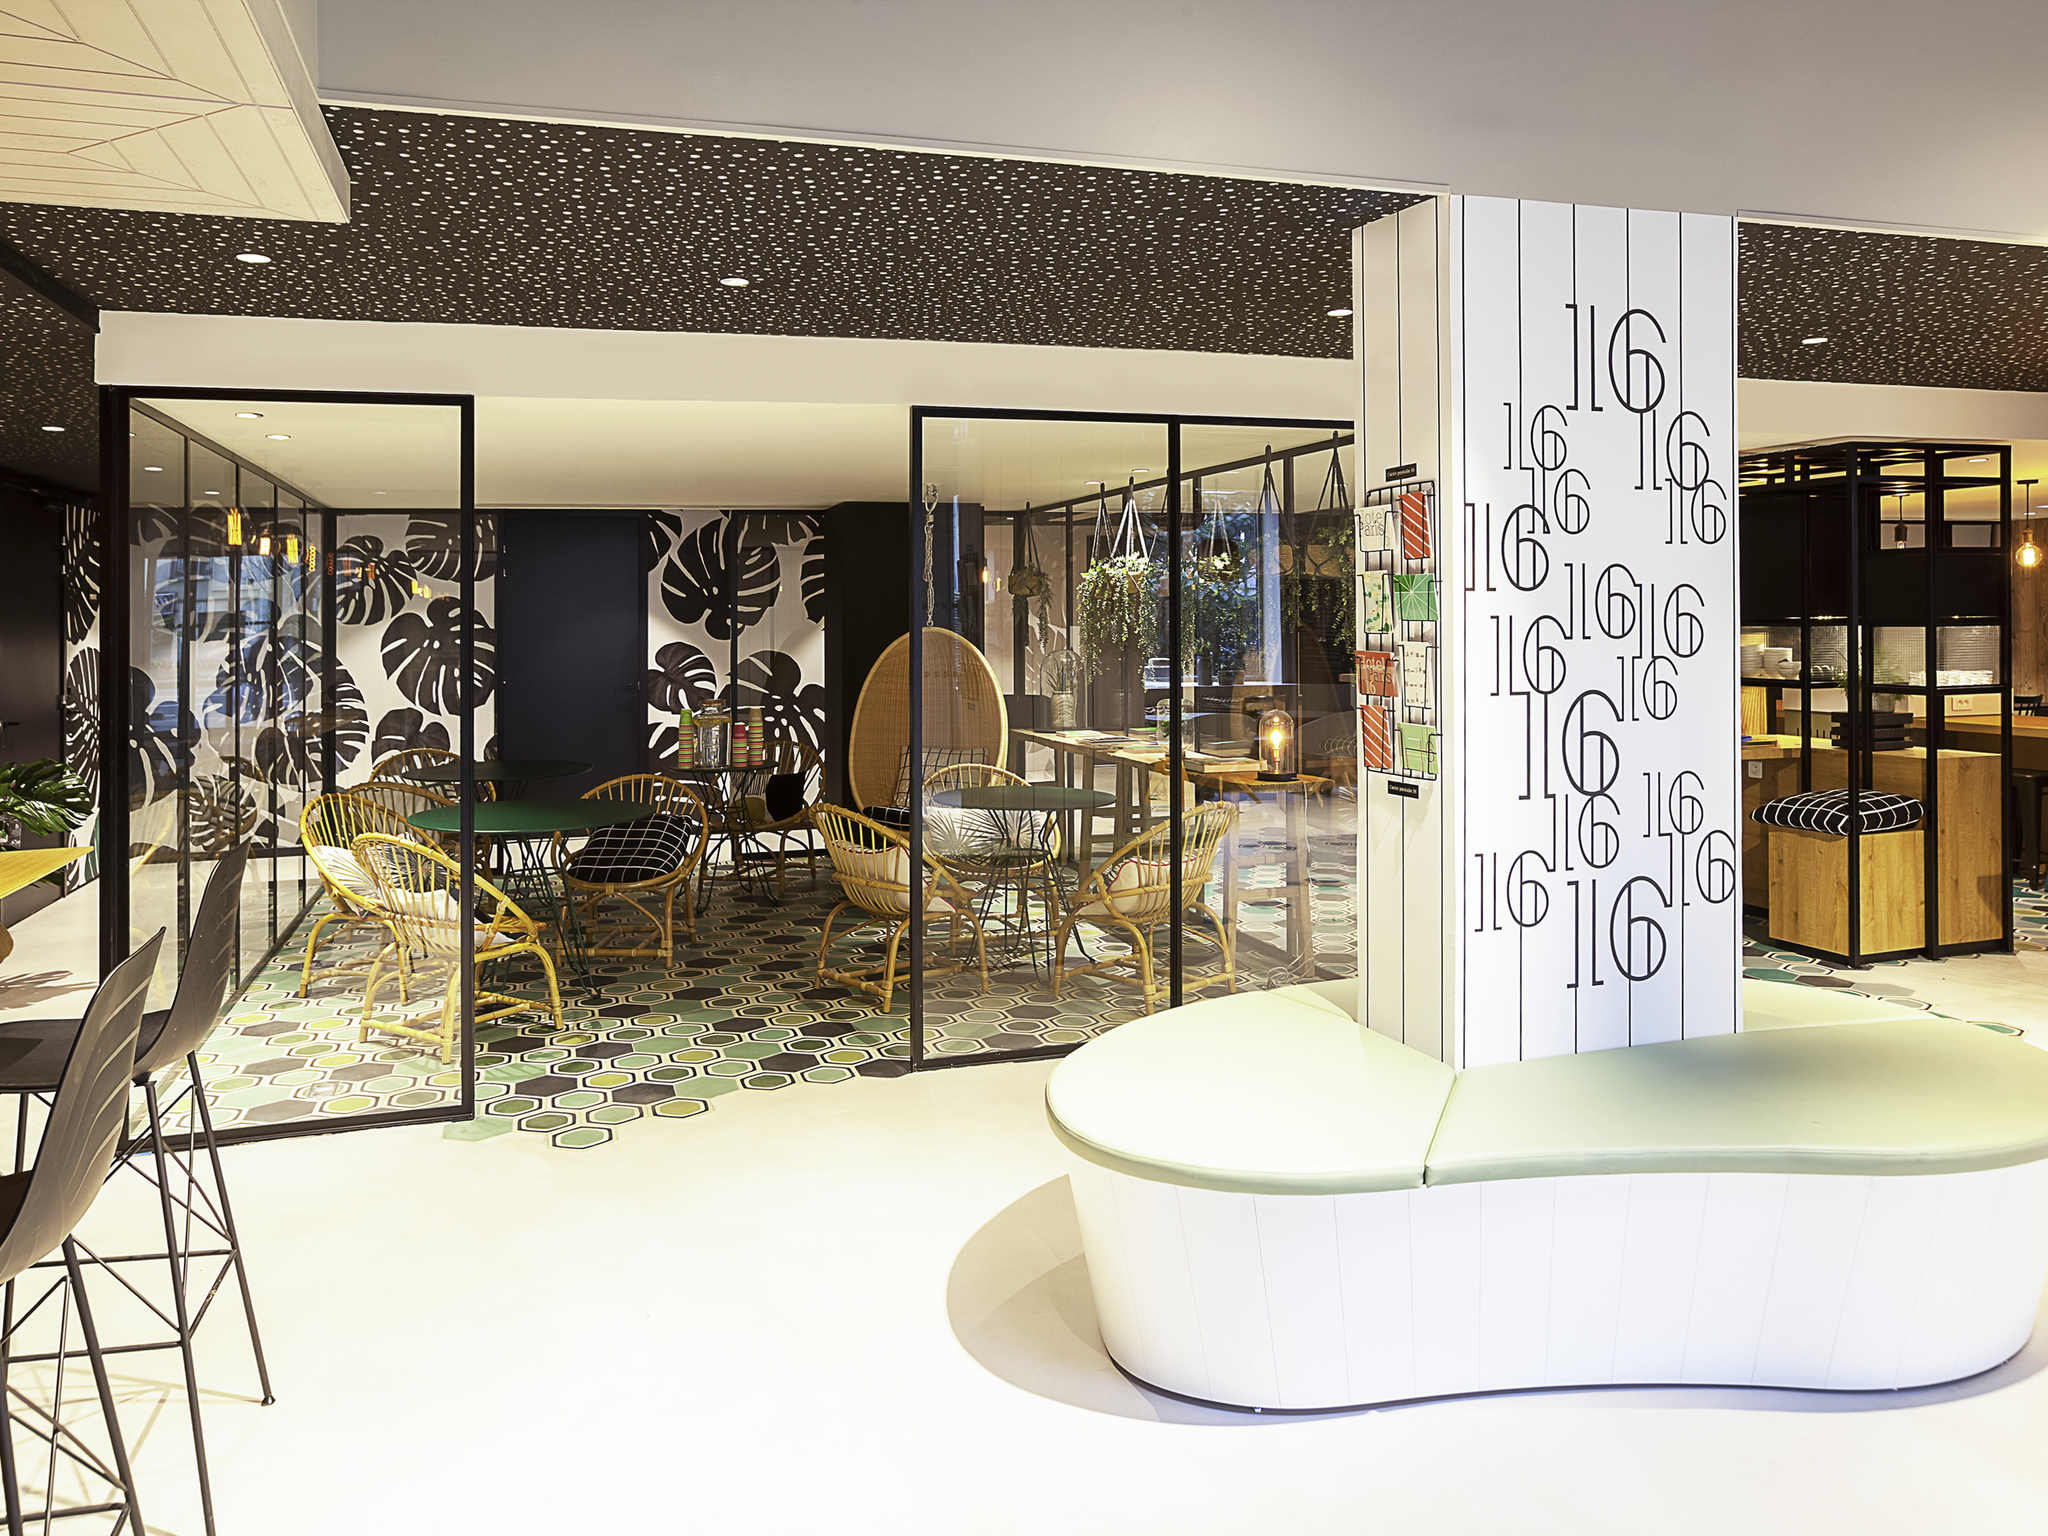 Otel – Ibis Styles Paris 16 Boulogne (Açılış: Kasım 2017)